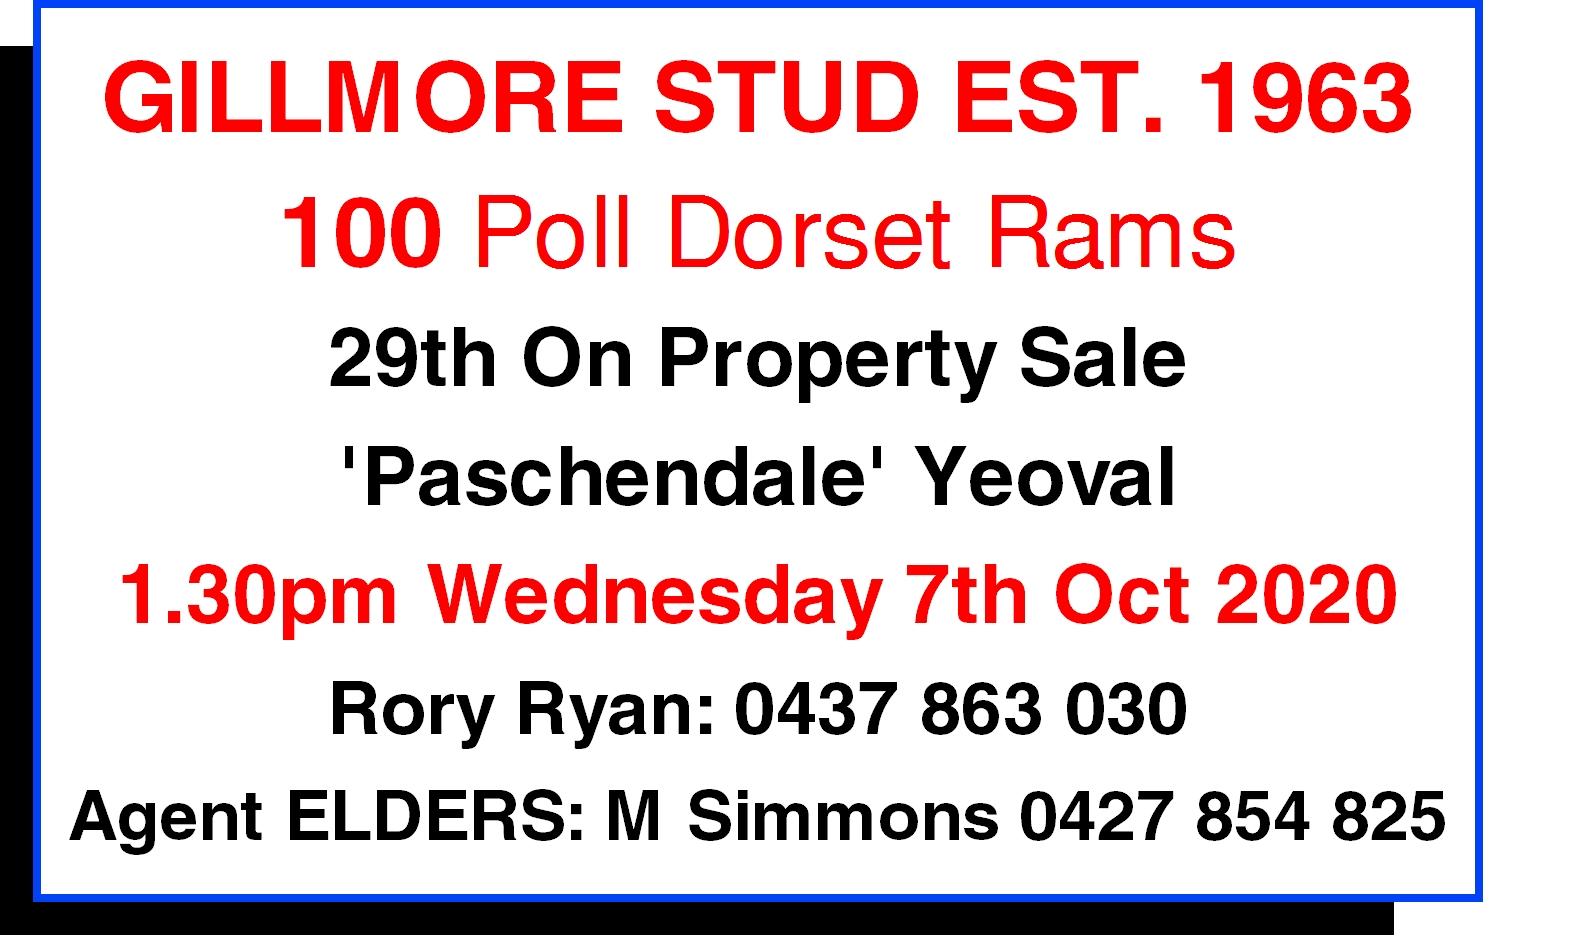 Gillmore Poll Dorset Ram Sale